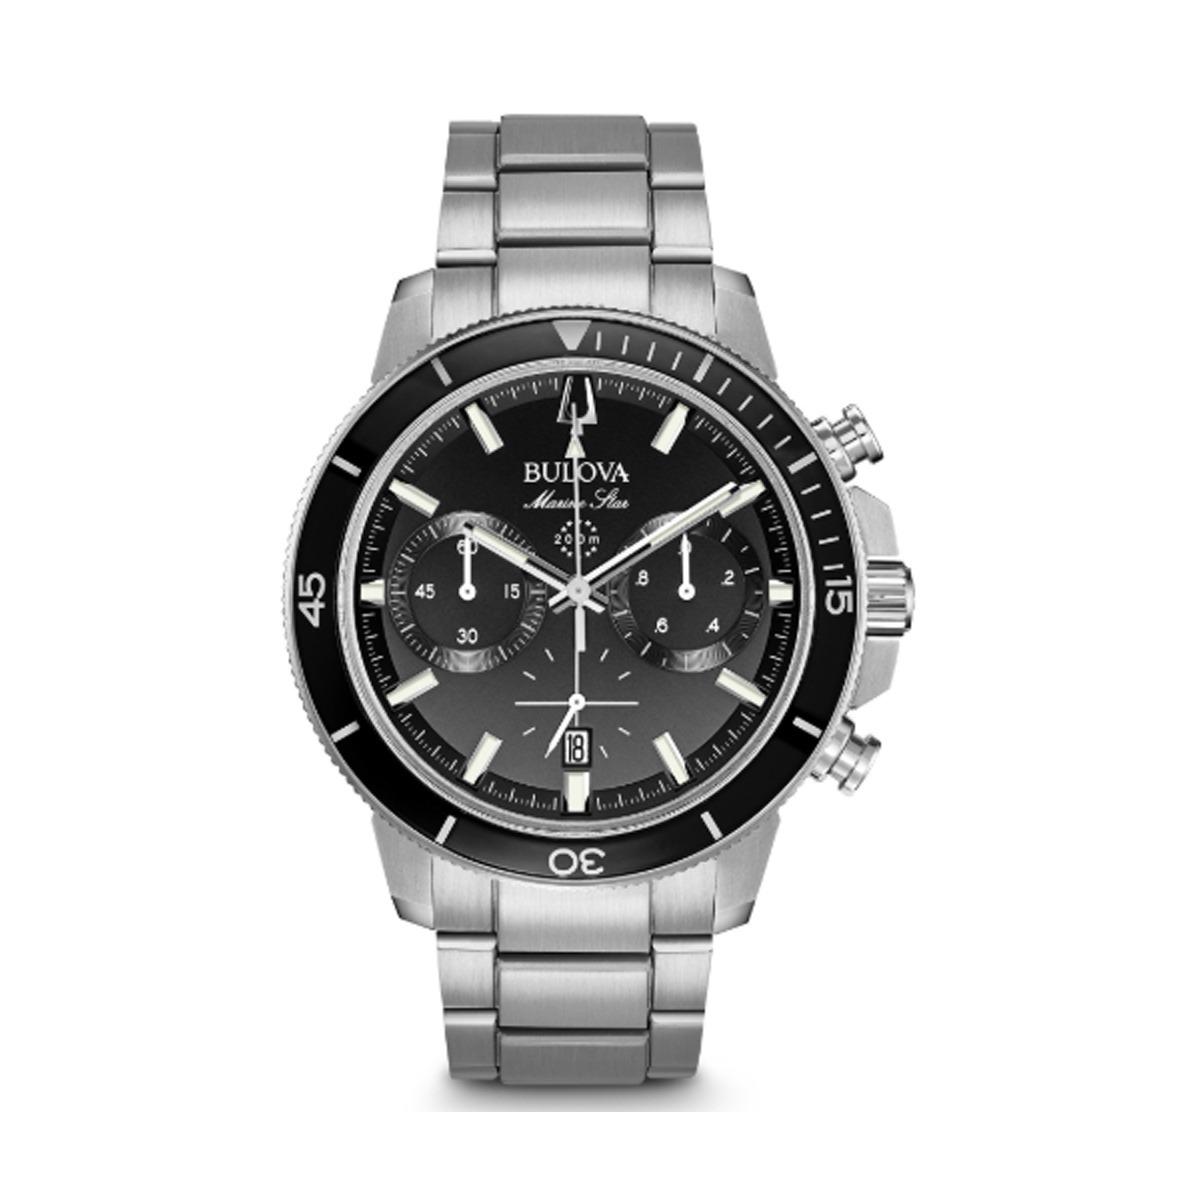 64e0ace32ee Relógio Bulova Masculino Marine Star Chronograph 96b272 - R  2.149 ...